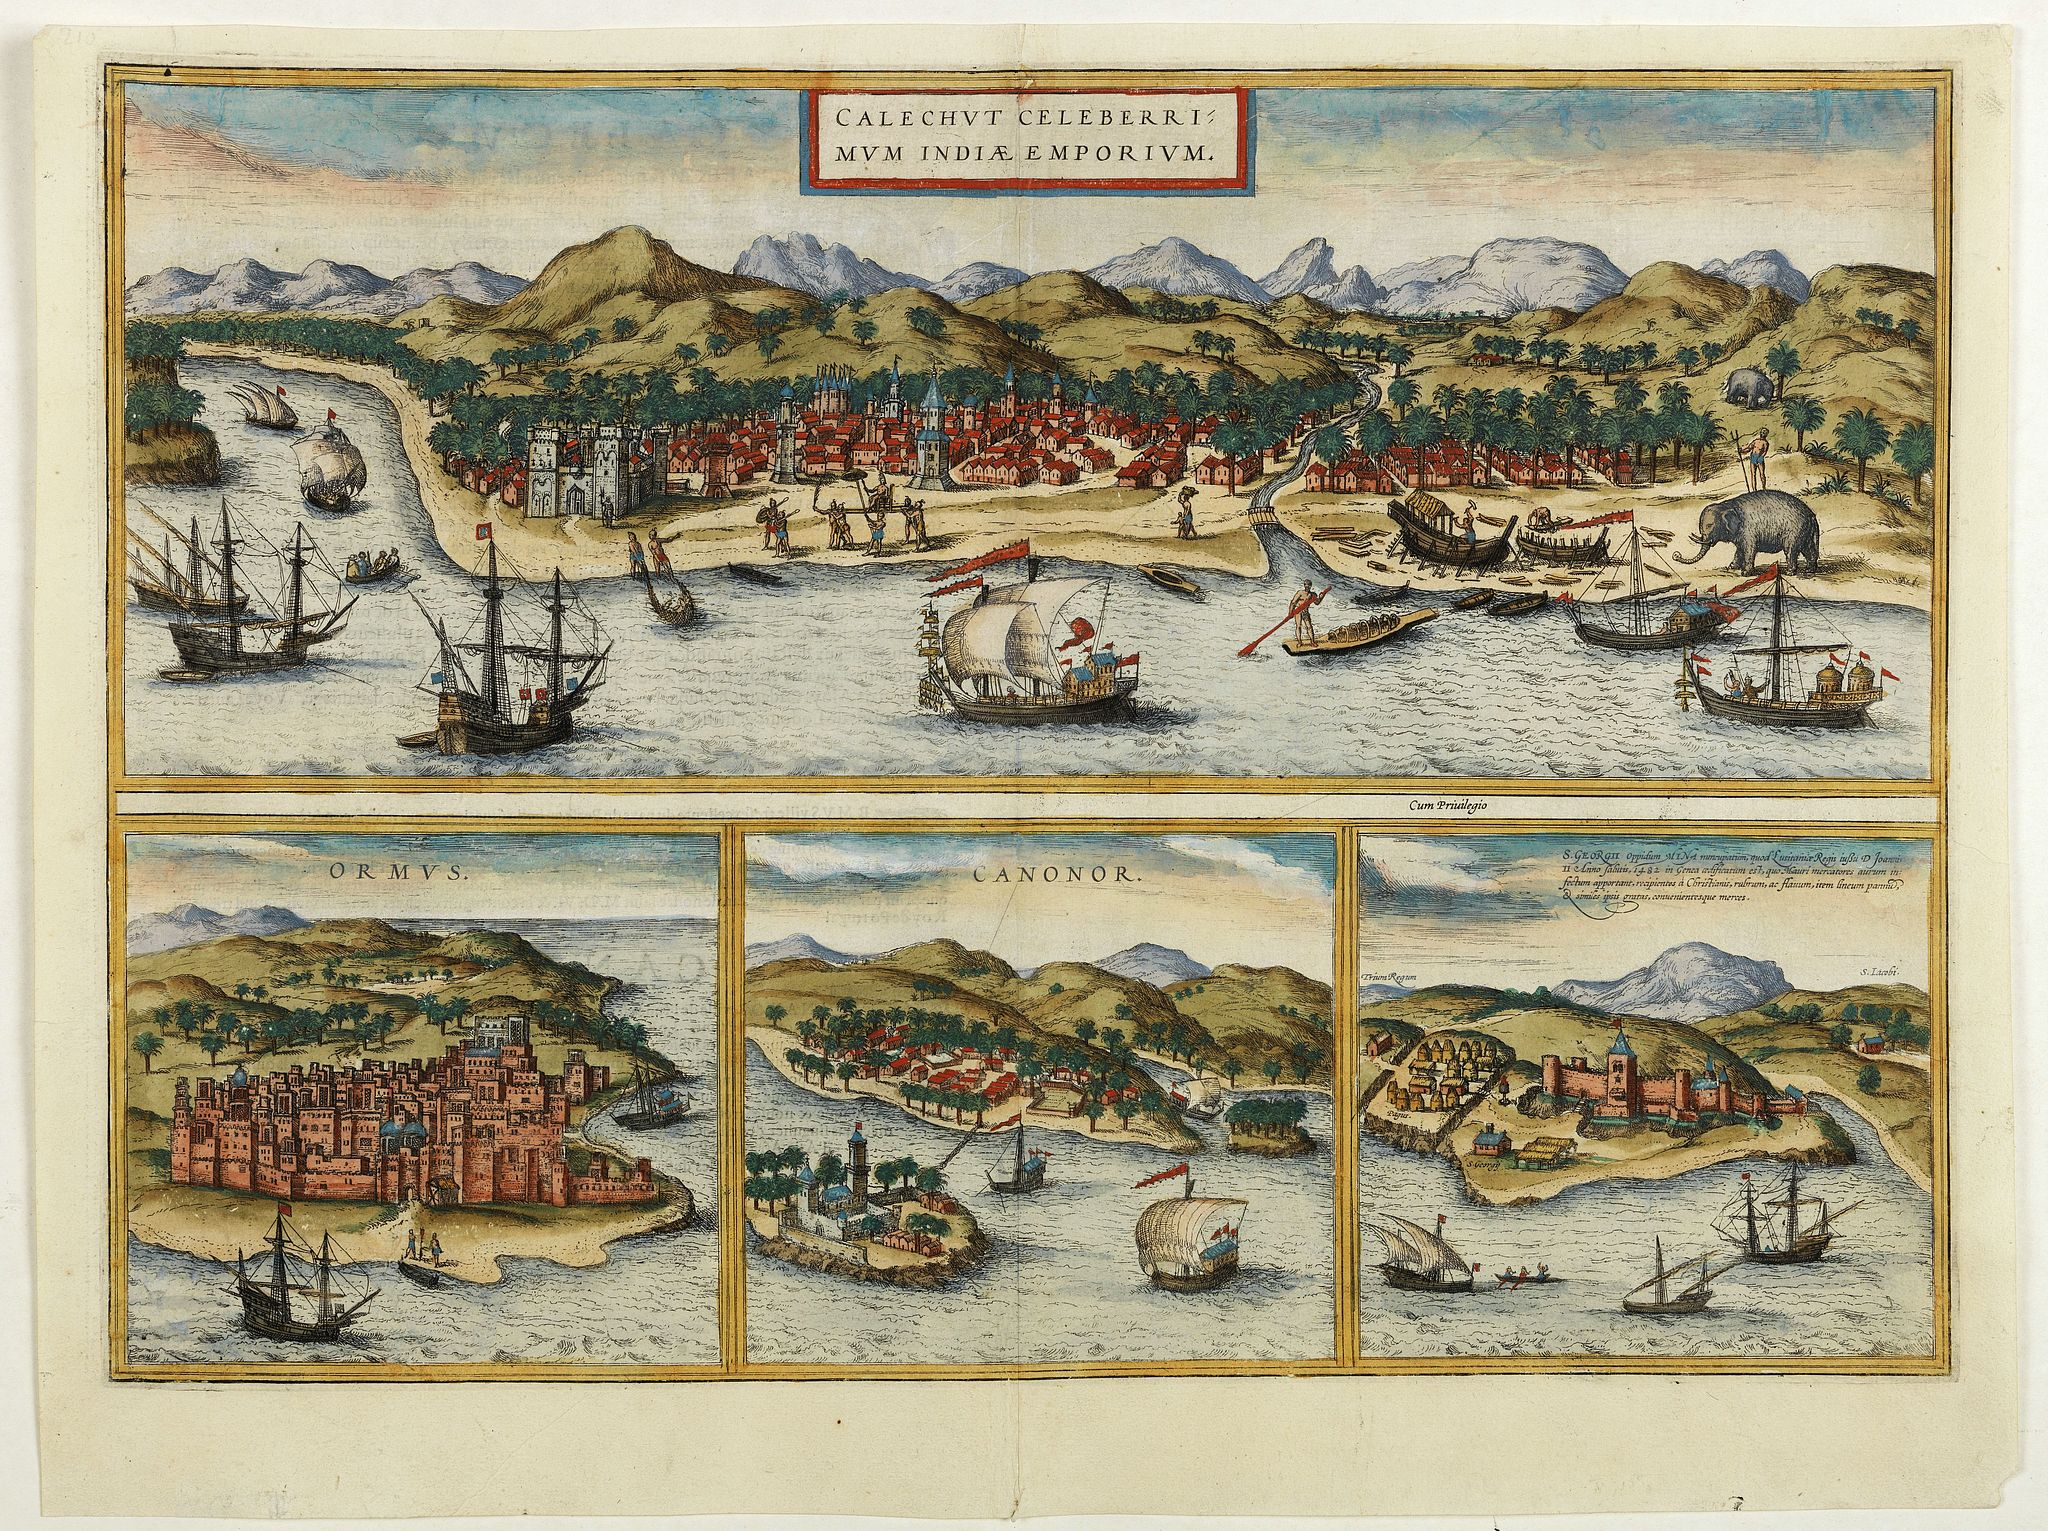 BRAUN,G. / HOGENBERG, F. -  Calechut Celeberrimum Indiae Emporium [on sheet with] Ormus [and] Canonor [and] S. Georgii Oppidum Mina.